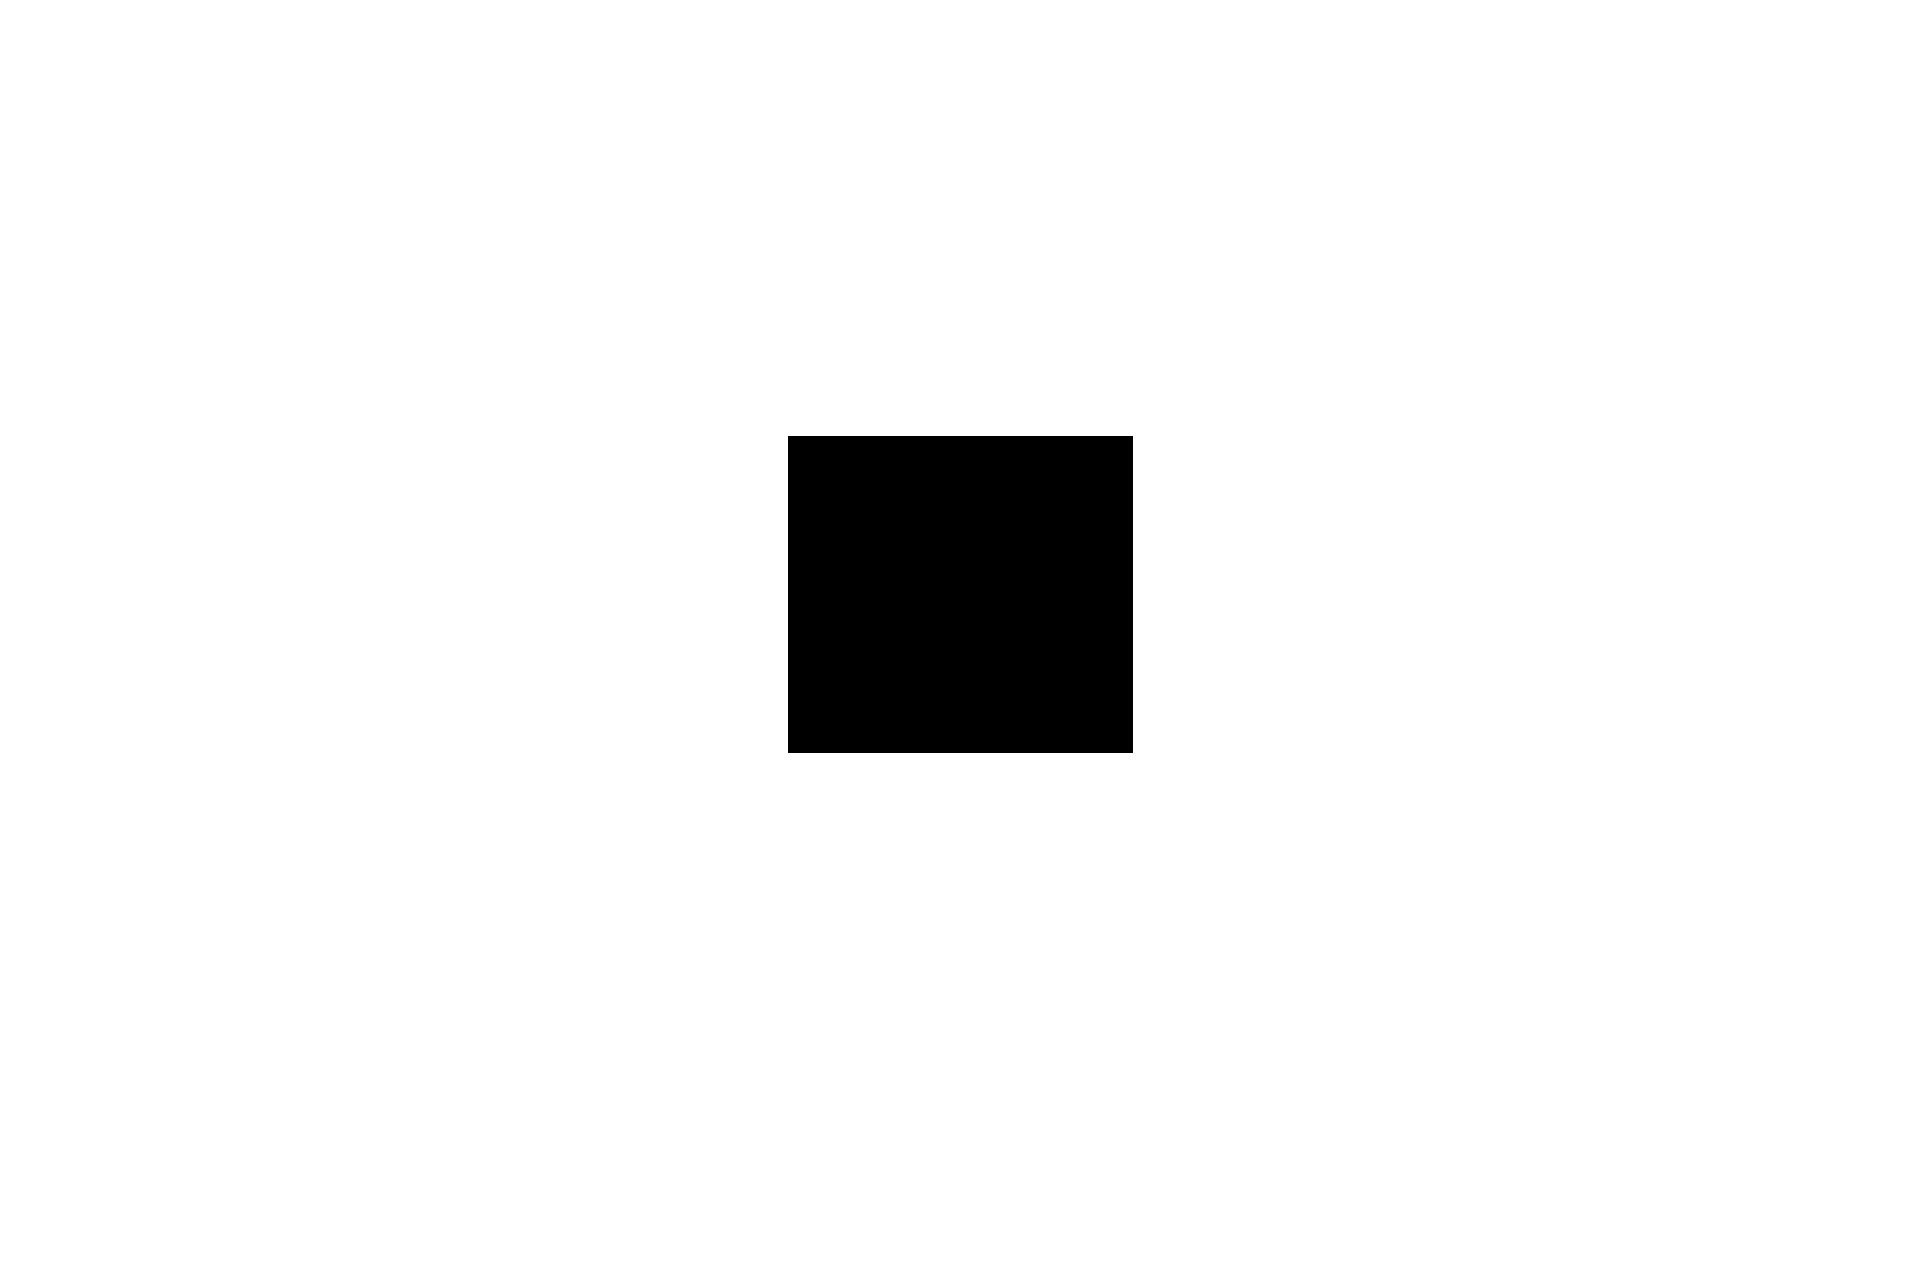 BiltokiCharte-copie-21